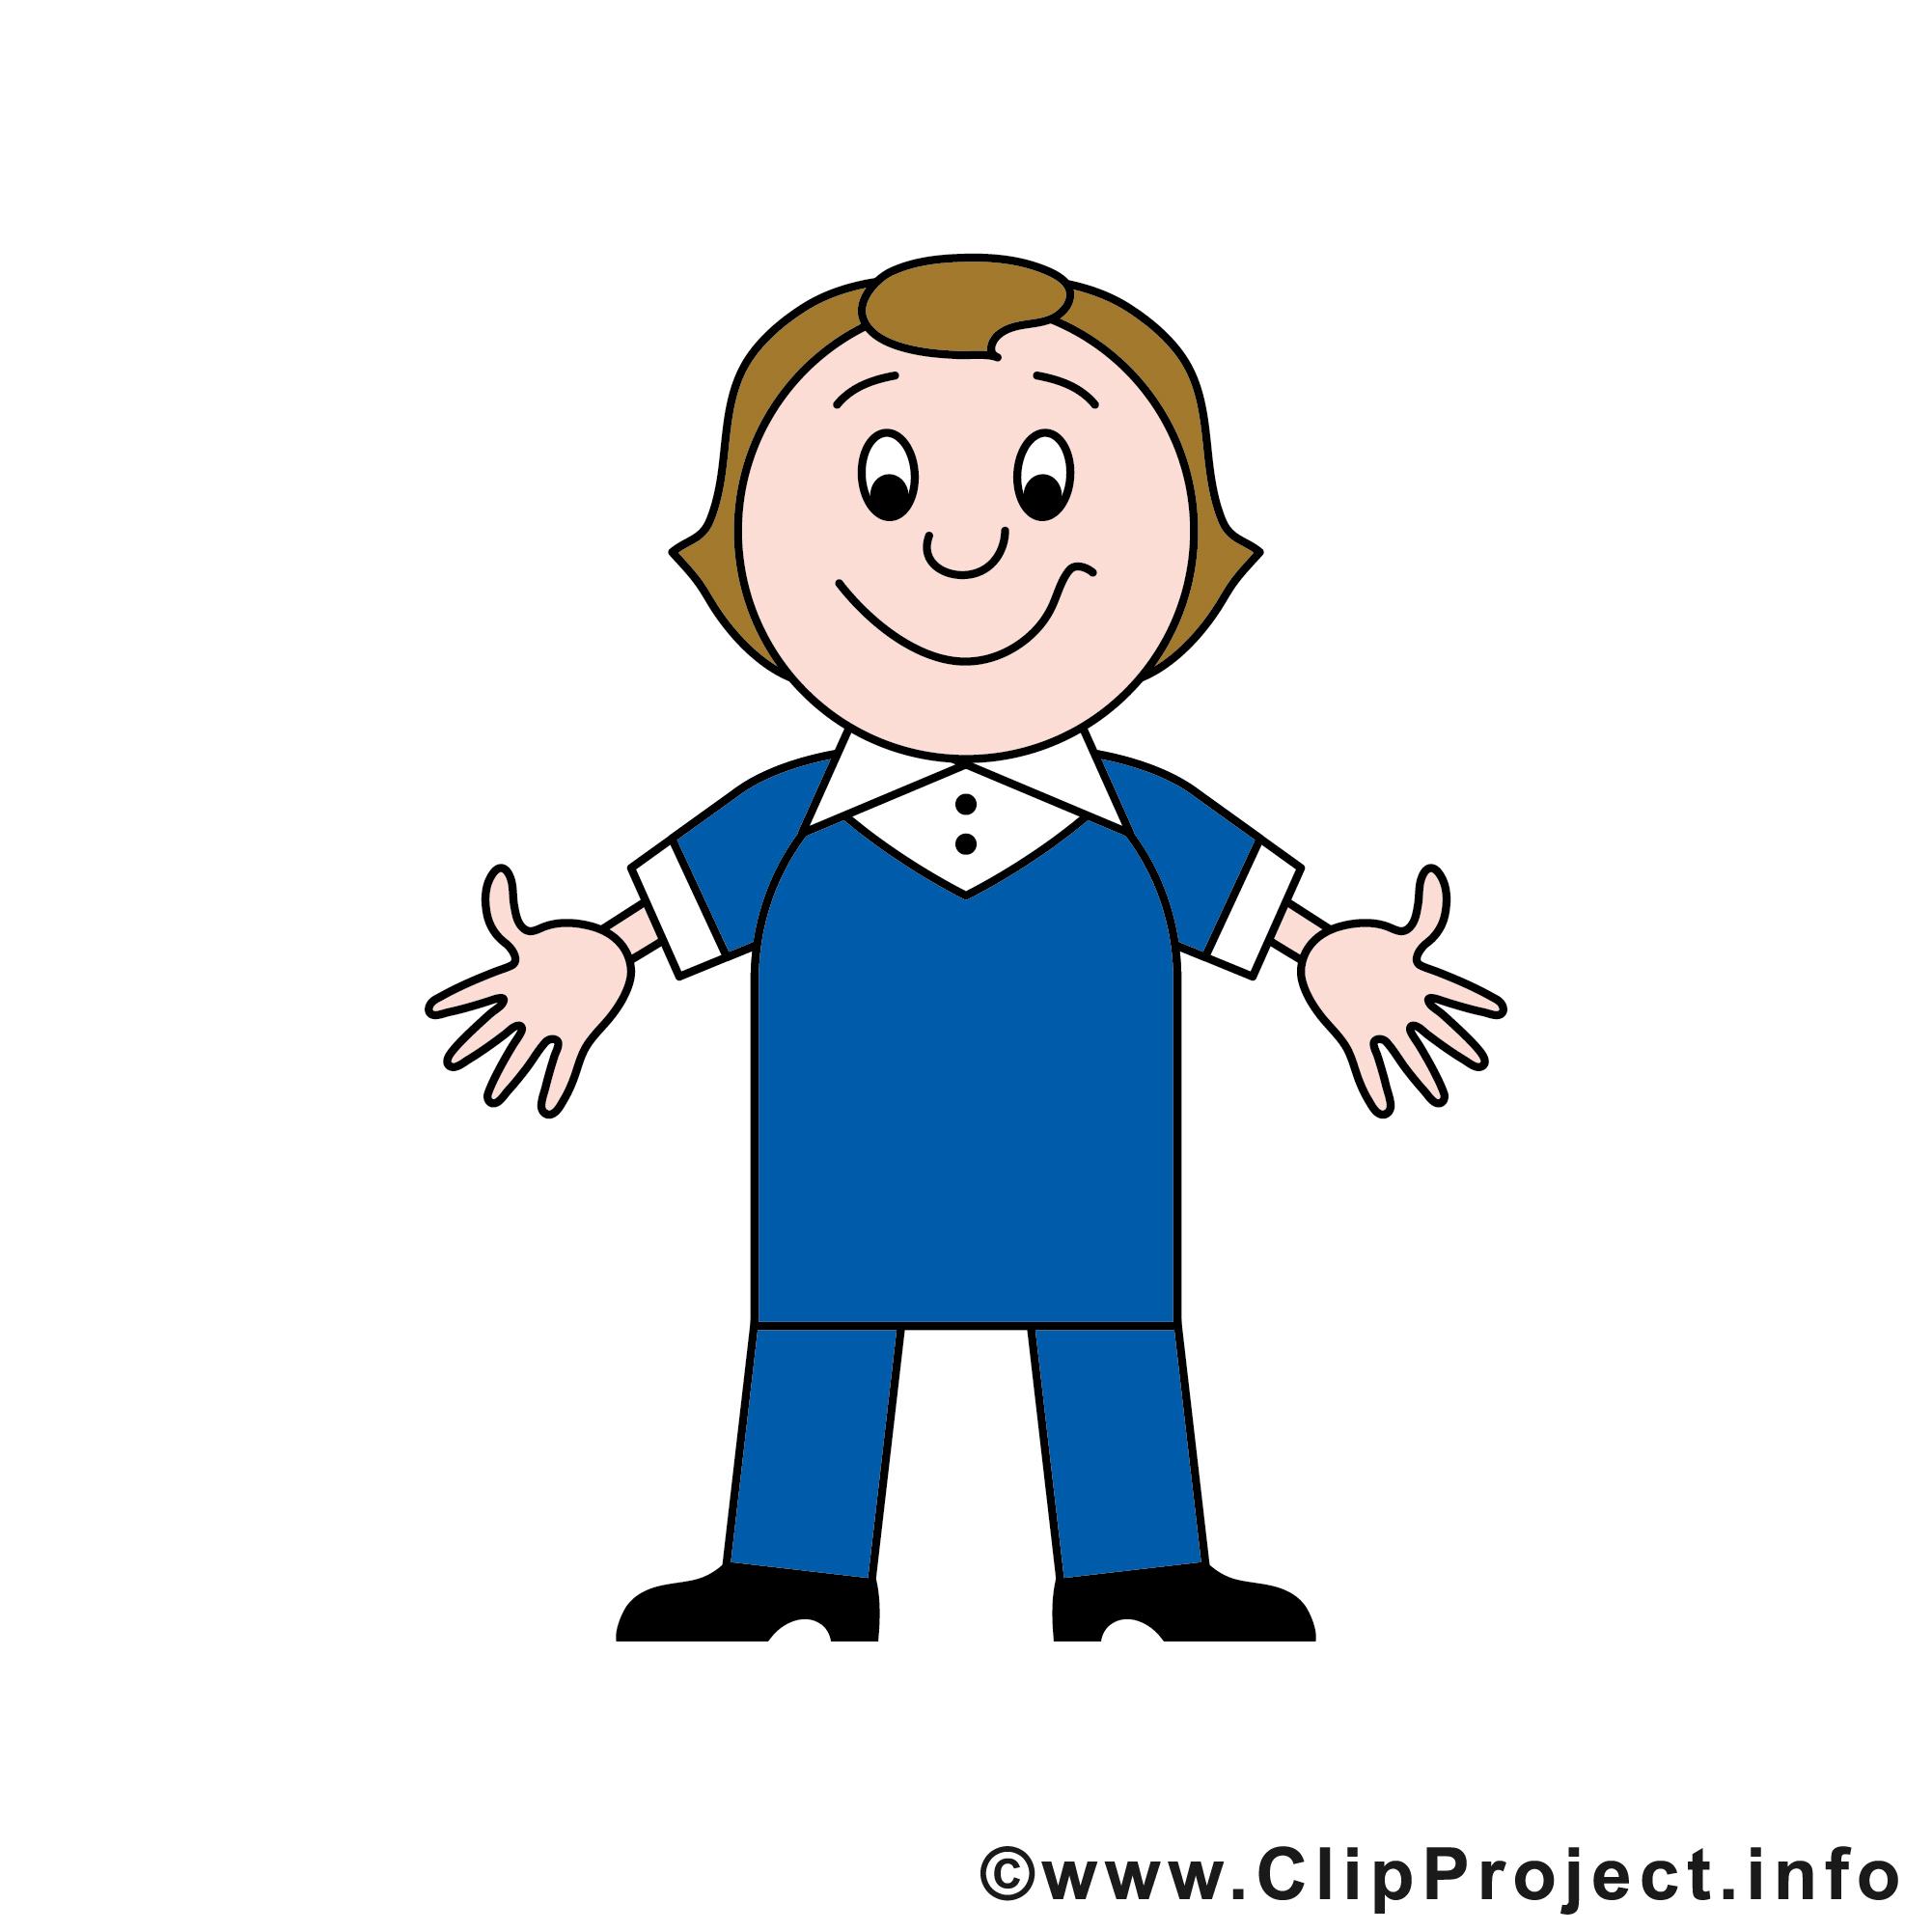 Büro frau clipart kostenlos  Mutter Clipart | Clipart Panda - Free Clipart Images